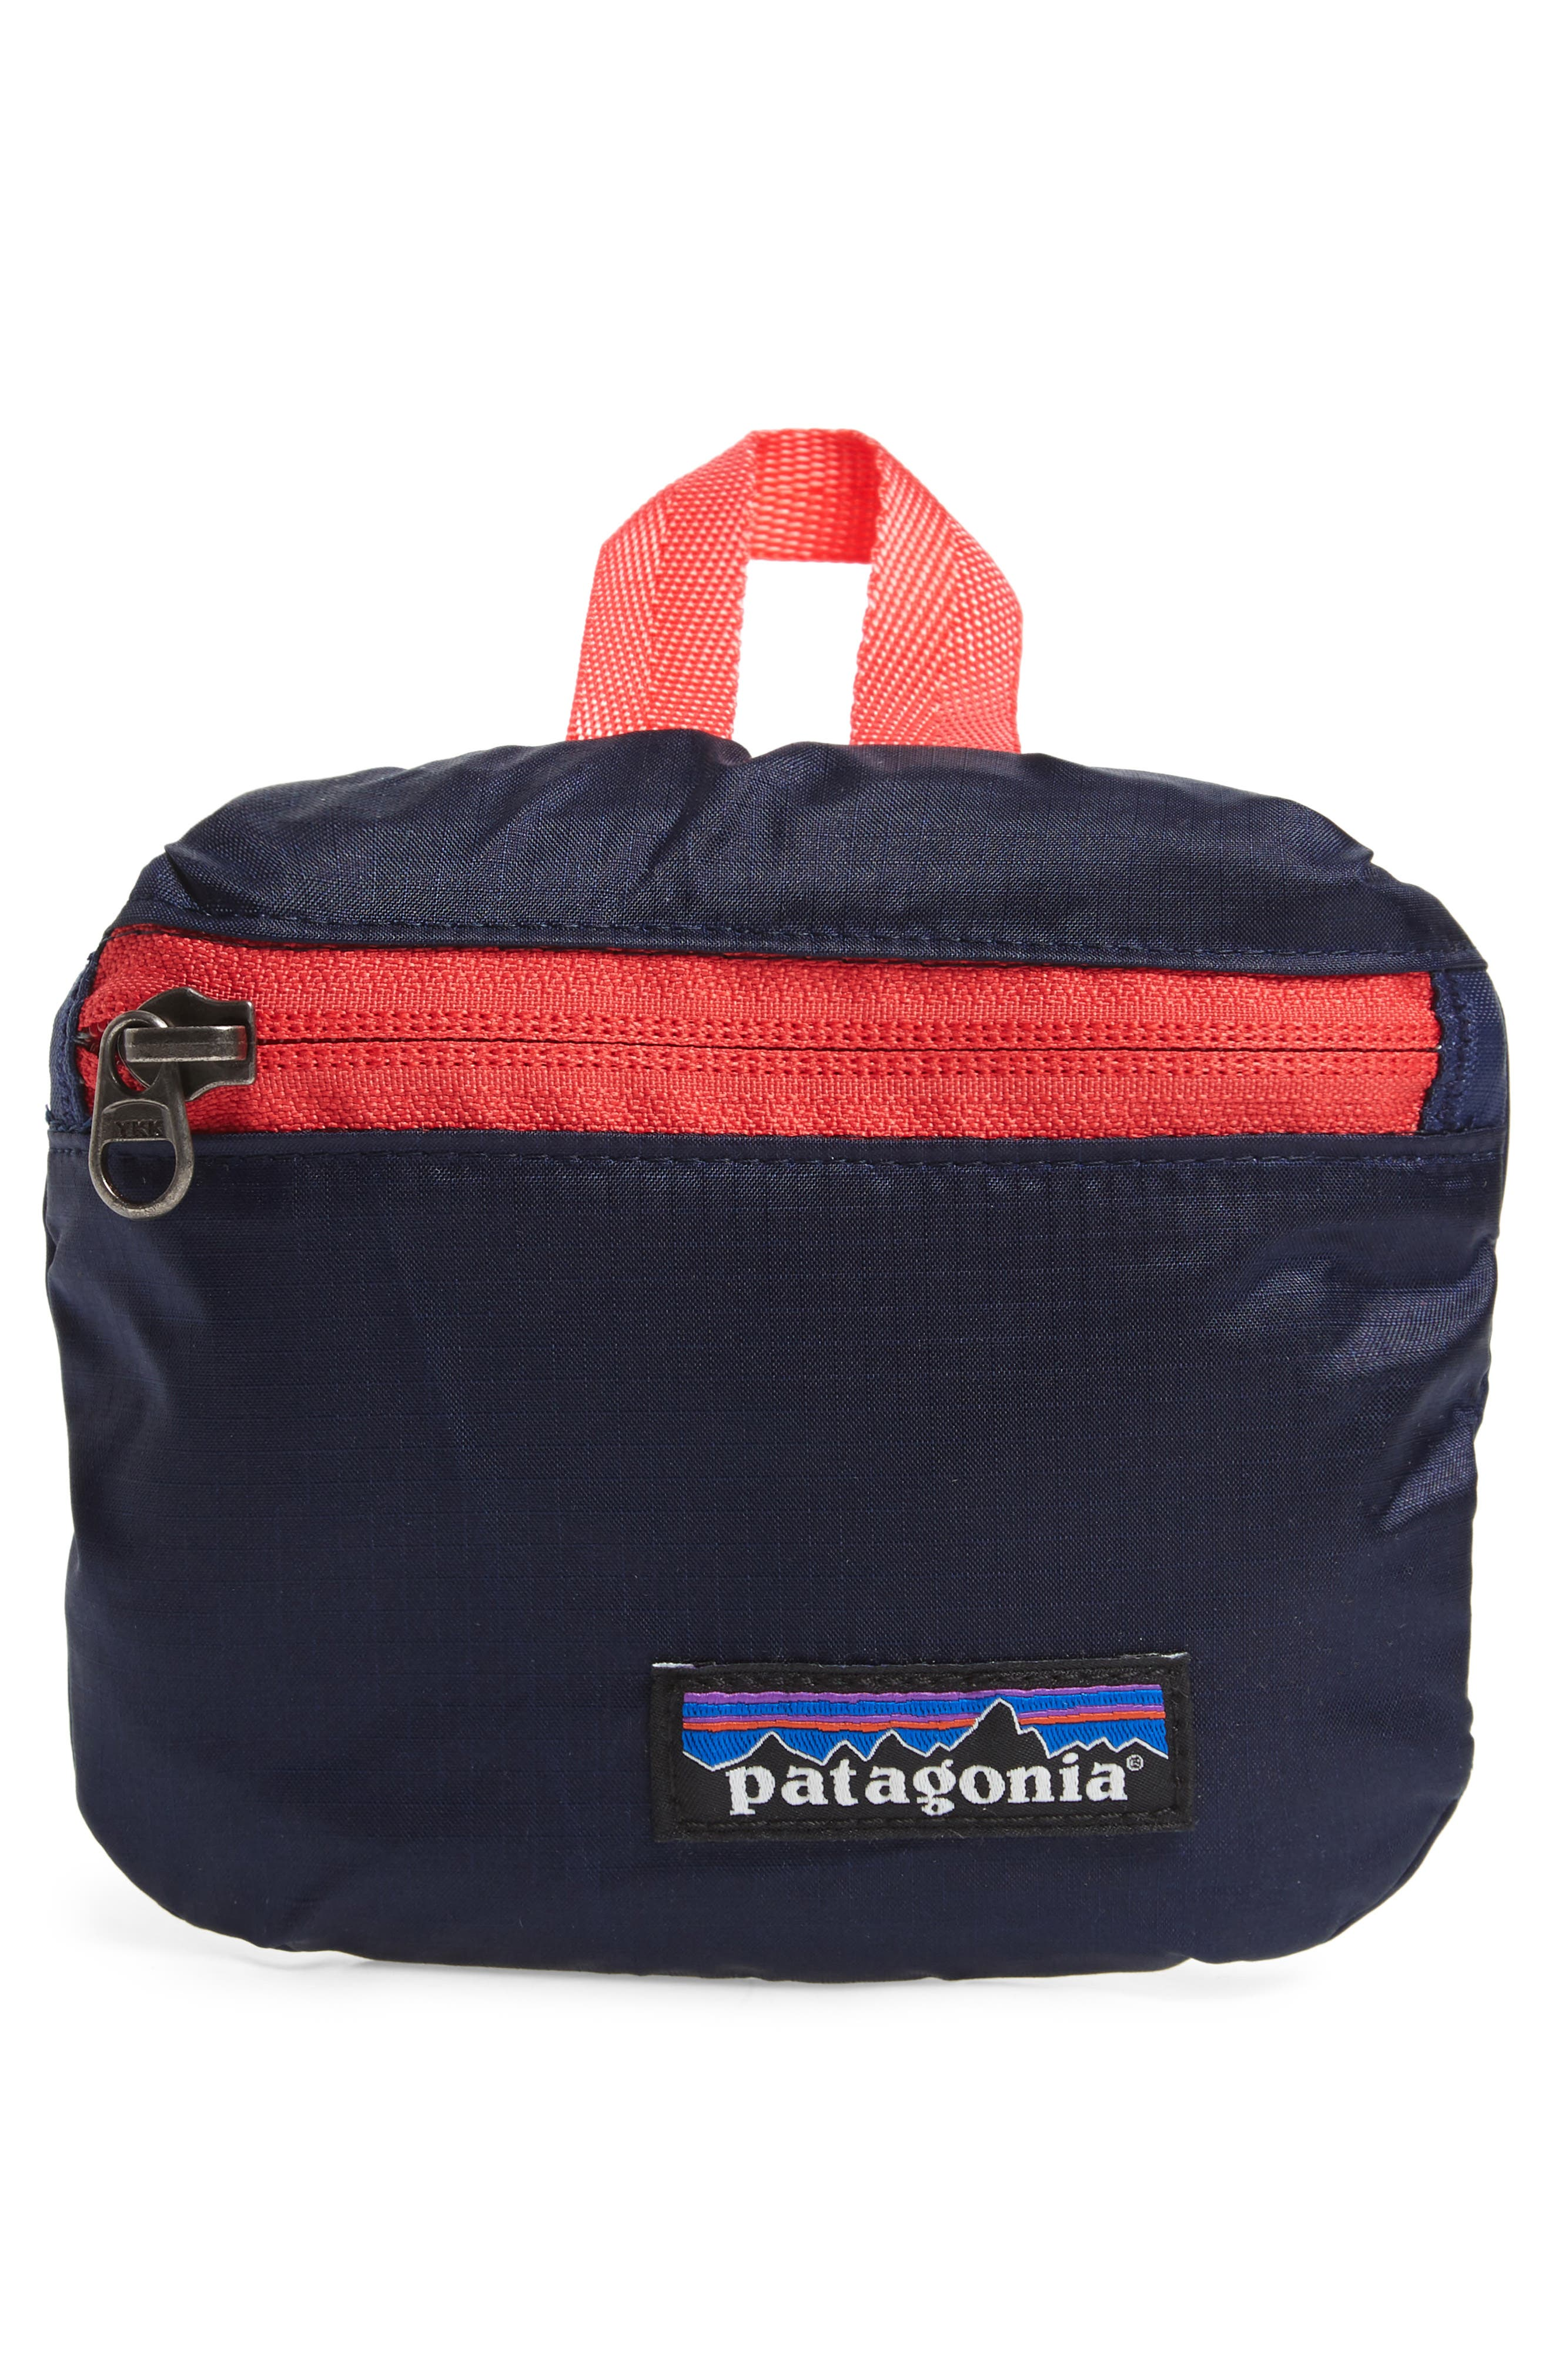 PATAGONIA, Travel Belt Bag, Alternate thumbnail 8, color, PATCHWORK ARROW RED / NAVY